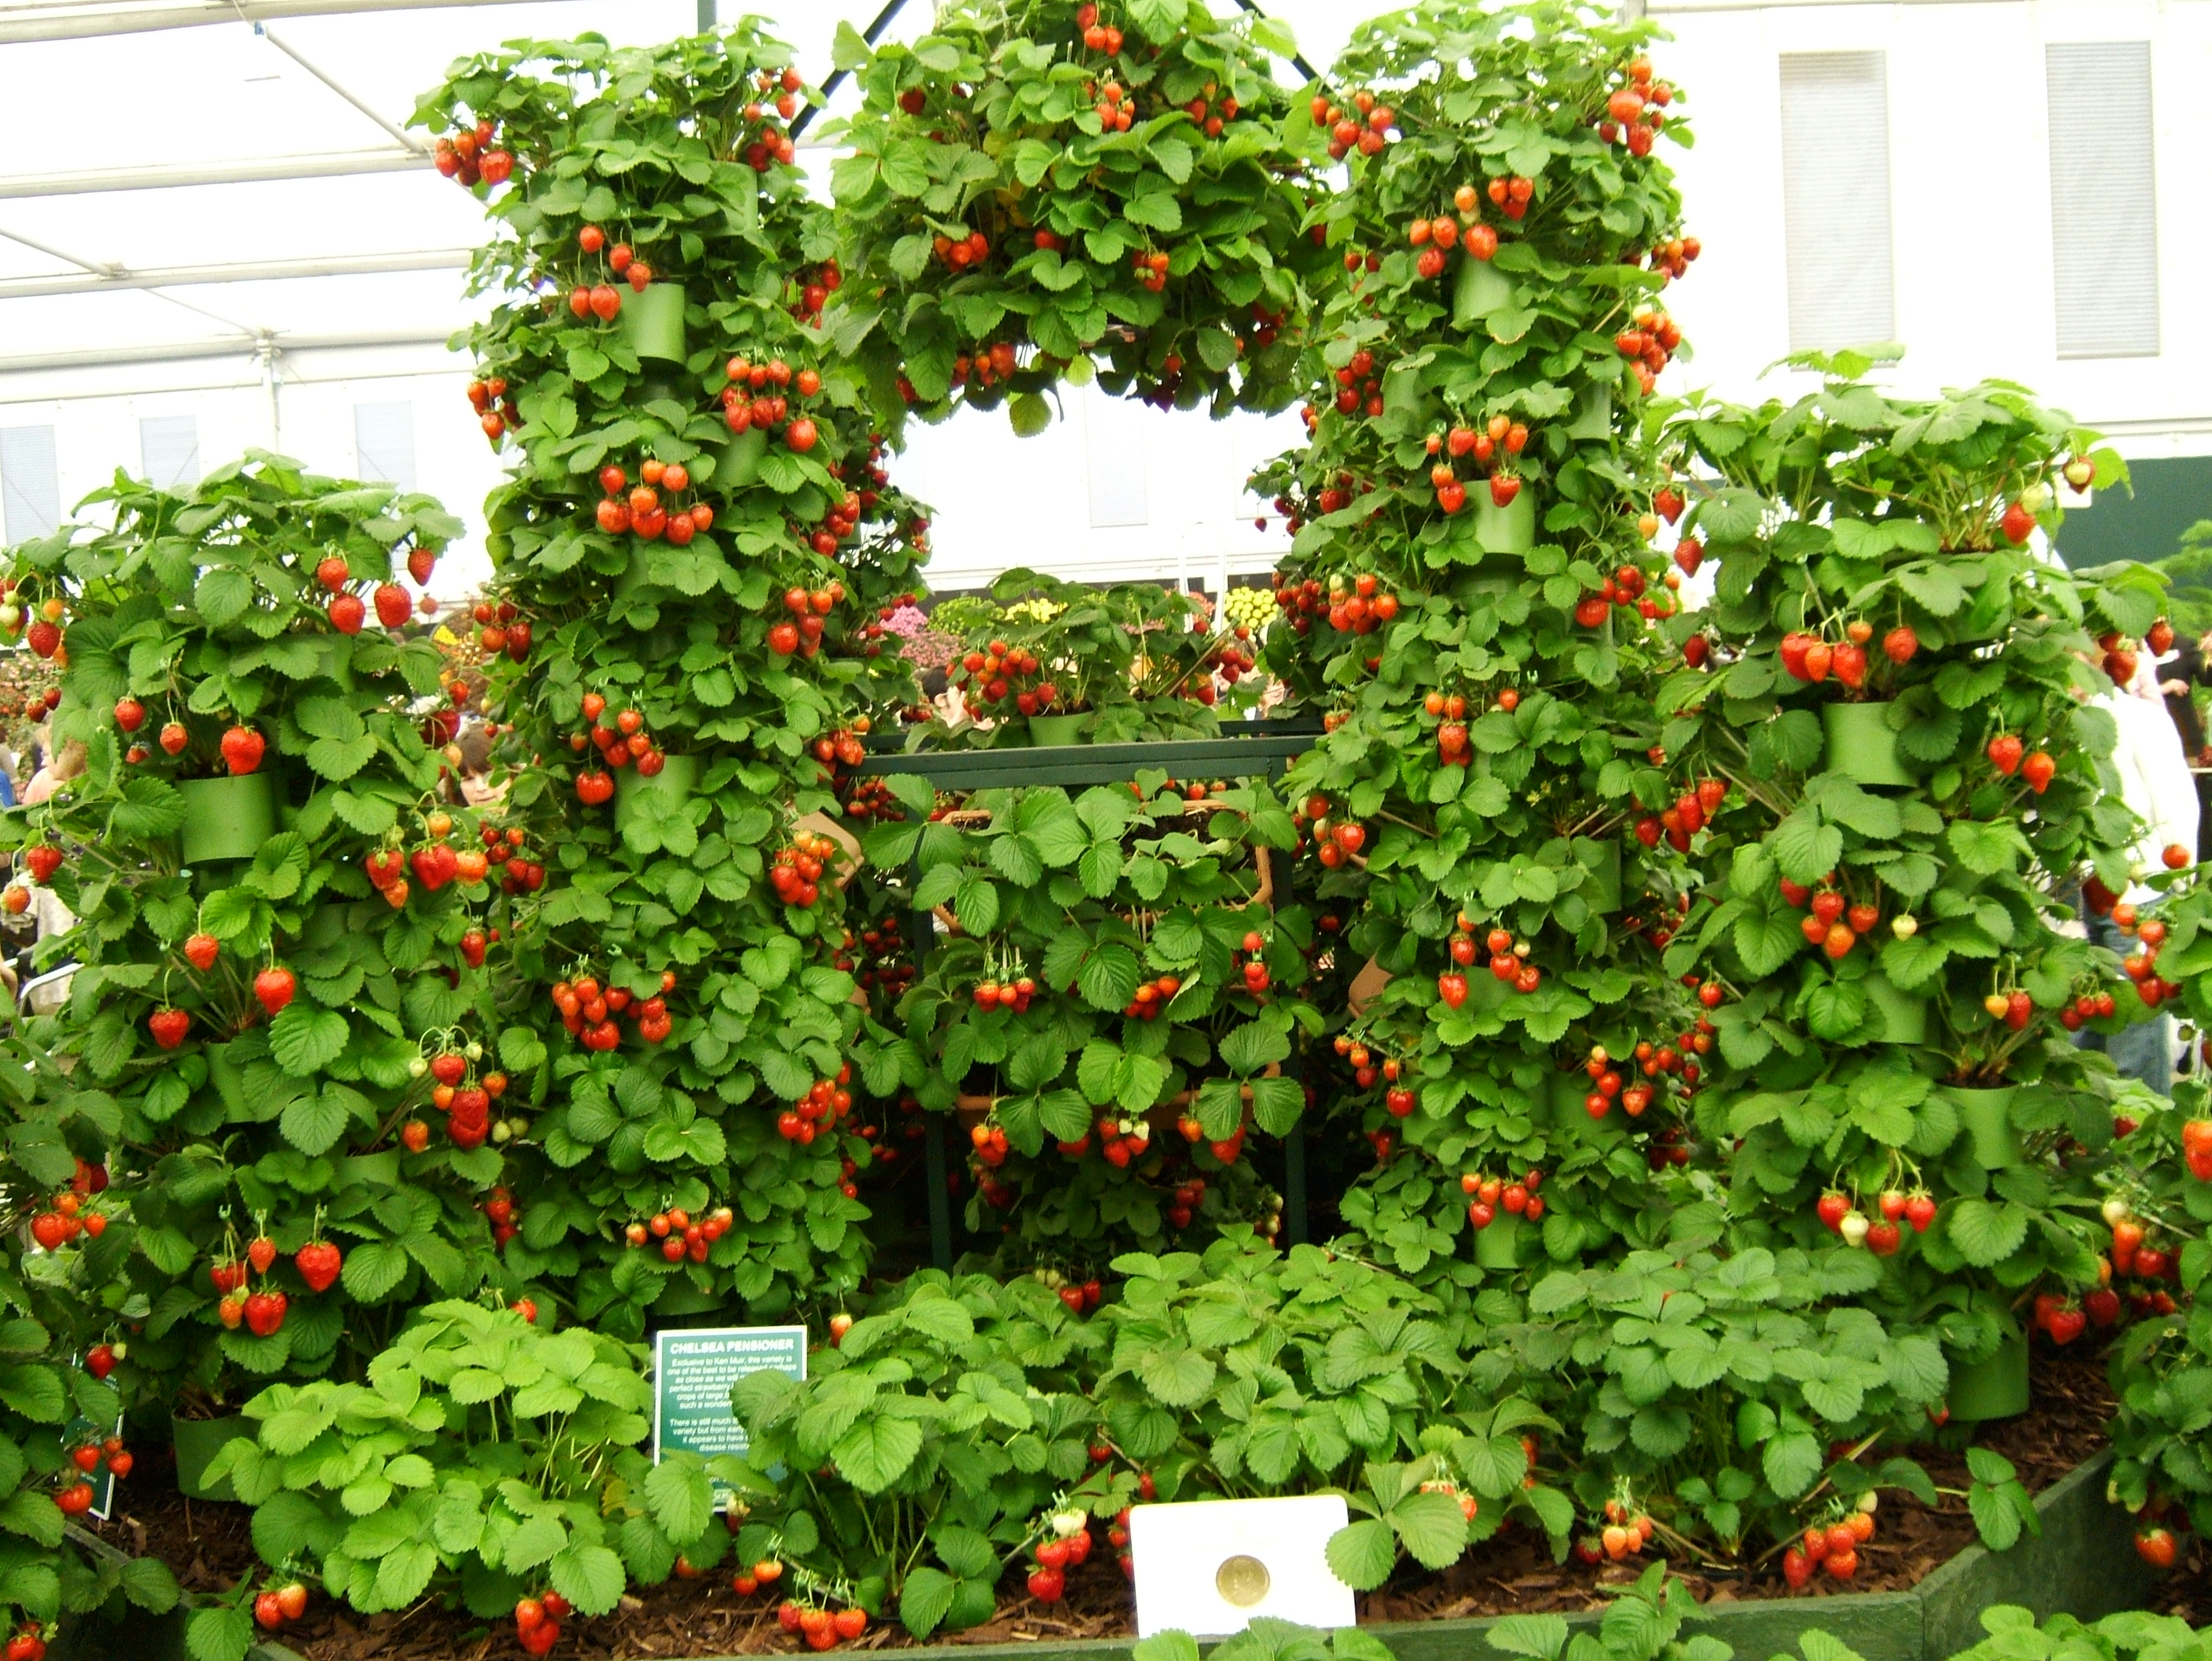 Strawberries on display at Chelsea Flower Show, June 19, 2008.